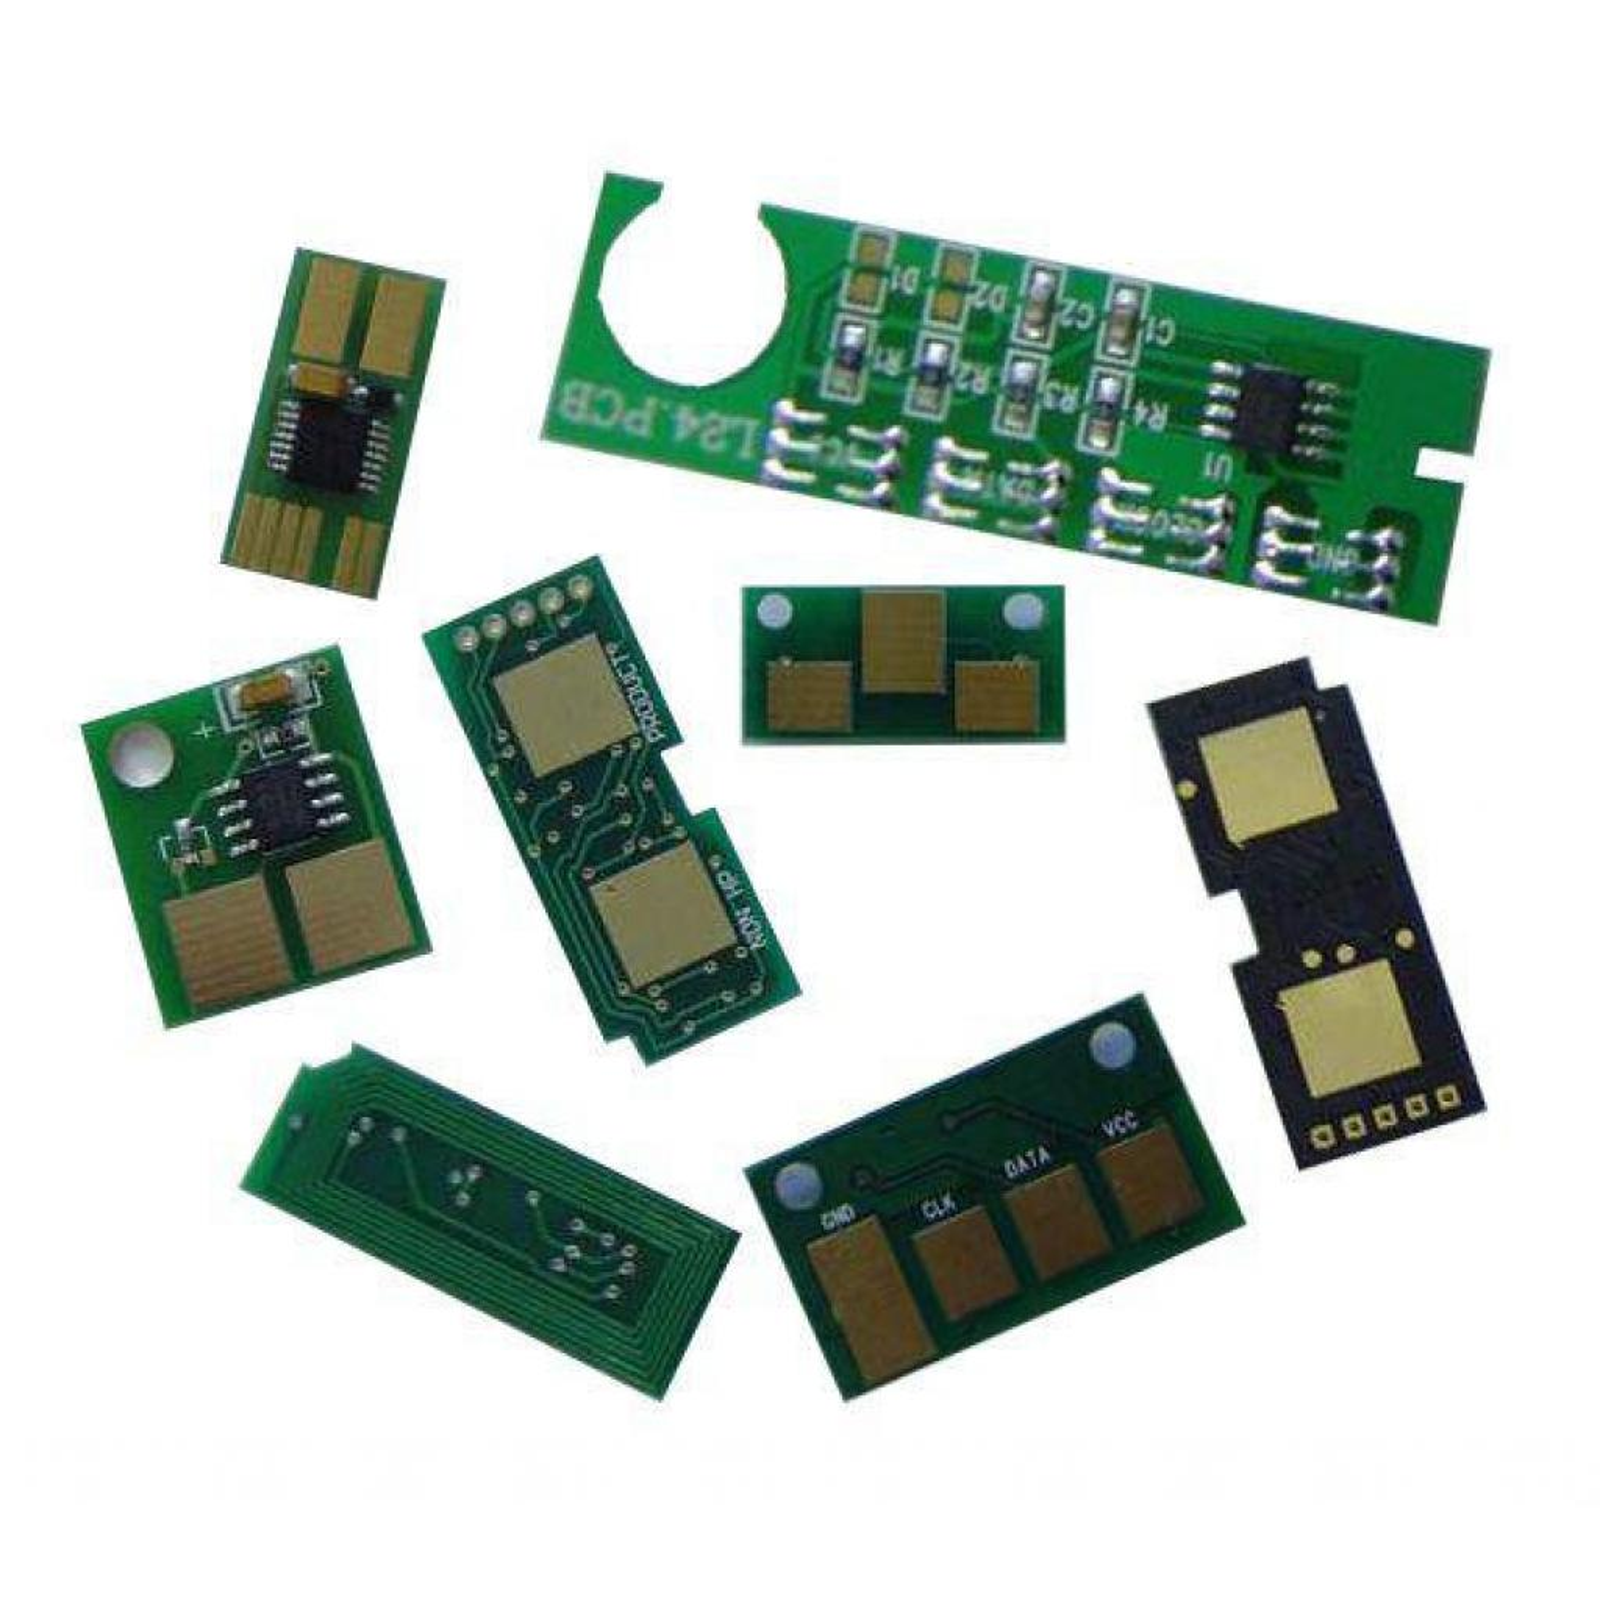 Чип для картриджа CANON 041 ДЛЯ LBP312 10K Everprint (CHIP-CAN-041)